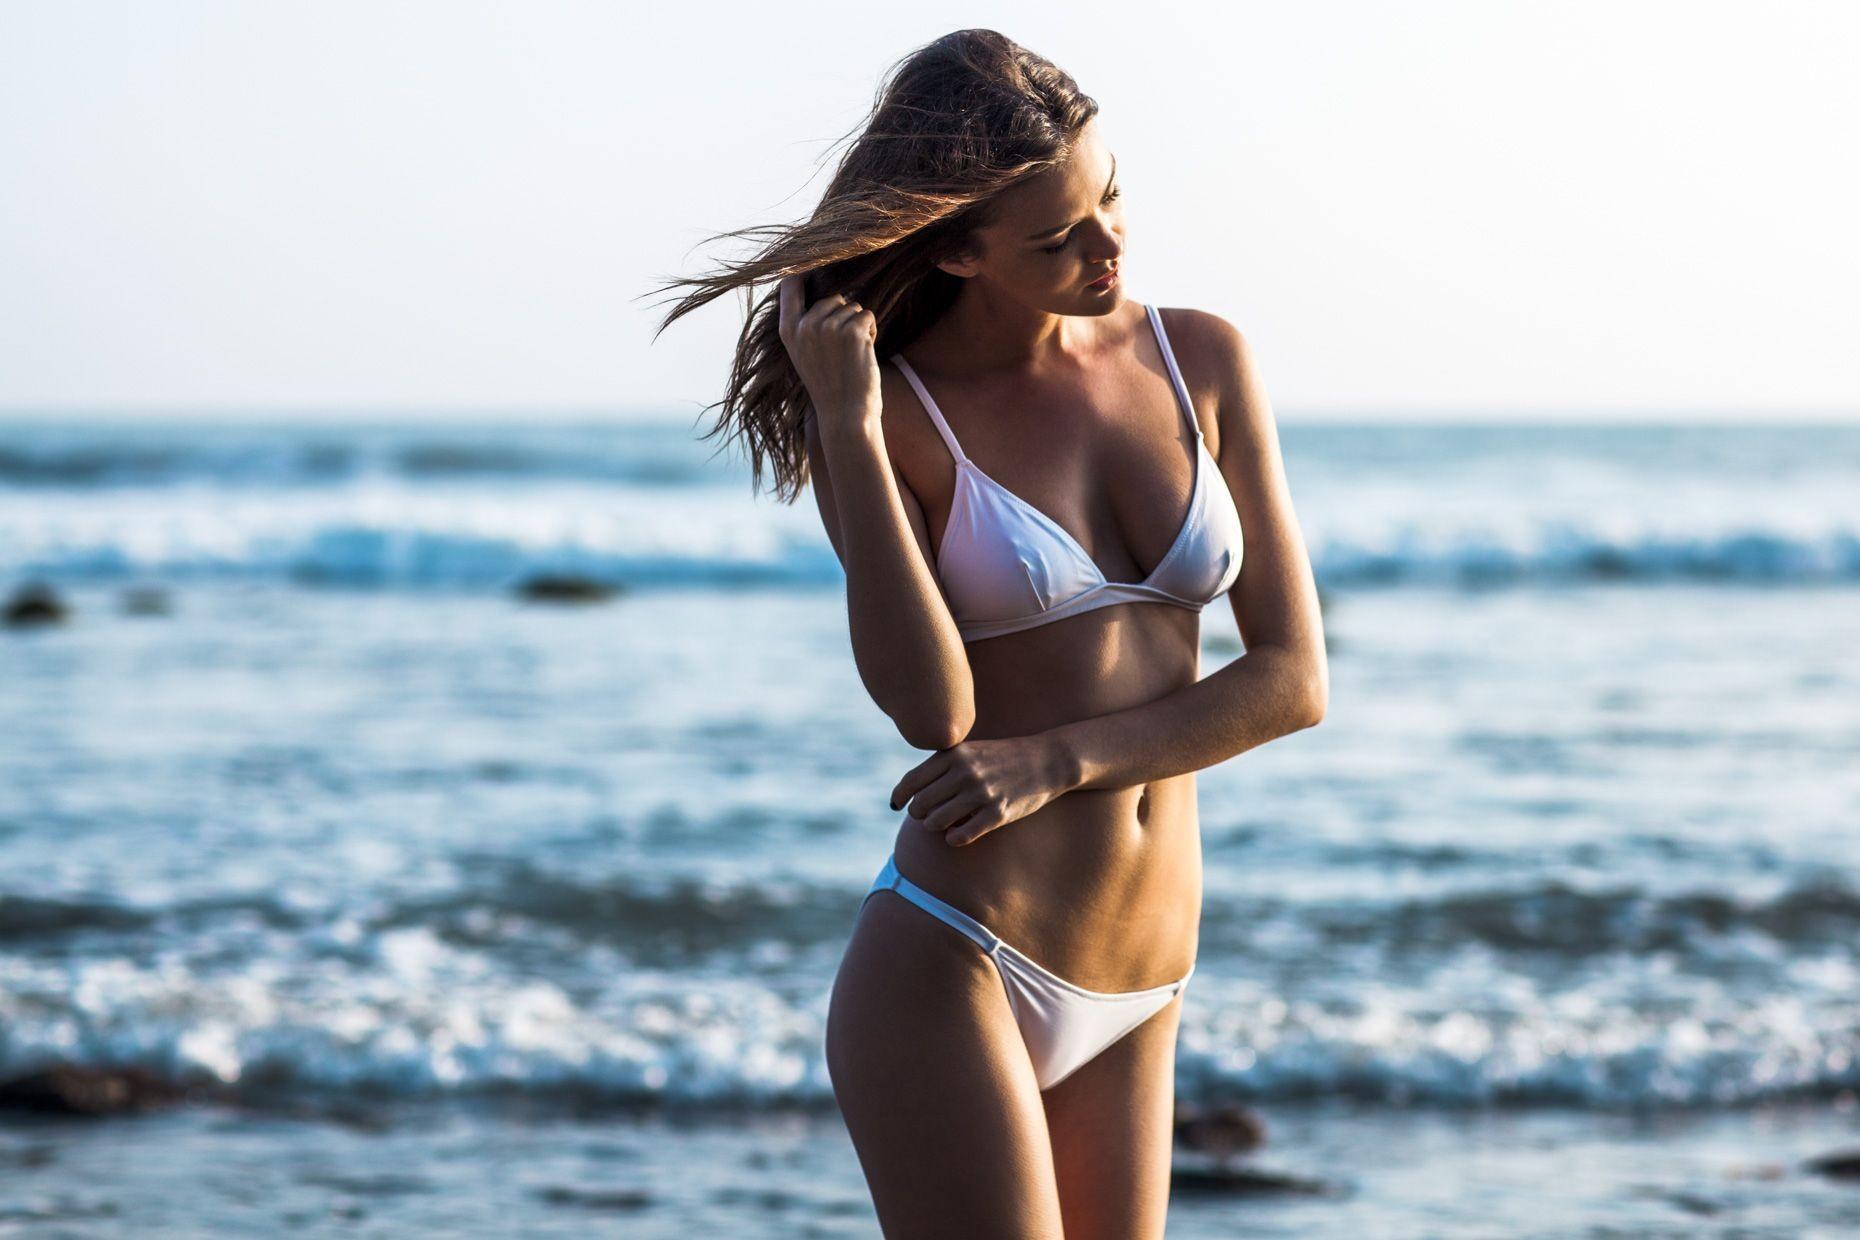 Katelyn Pascavis Nude Sexy - 2019 year